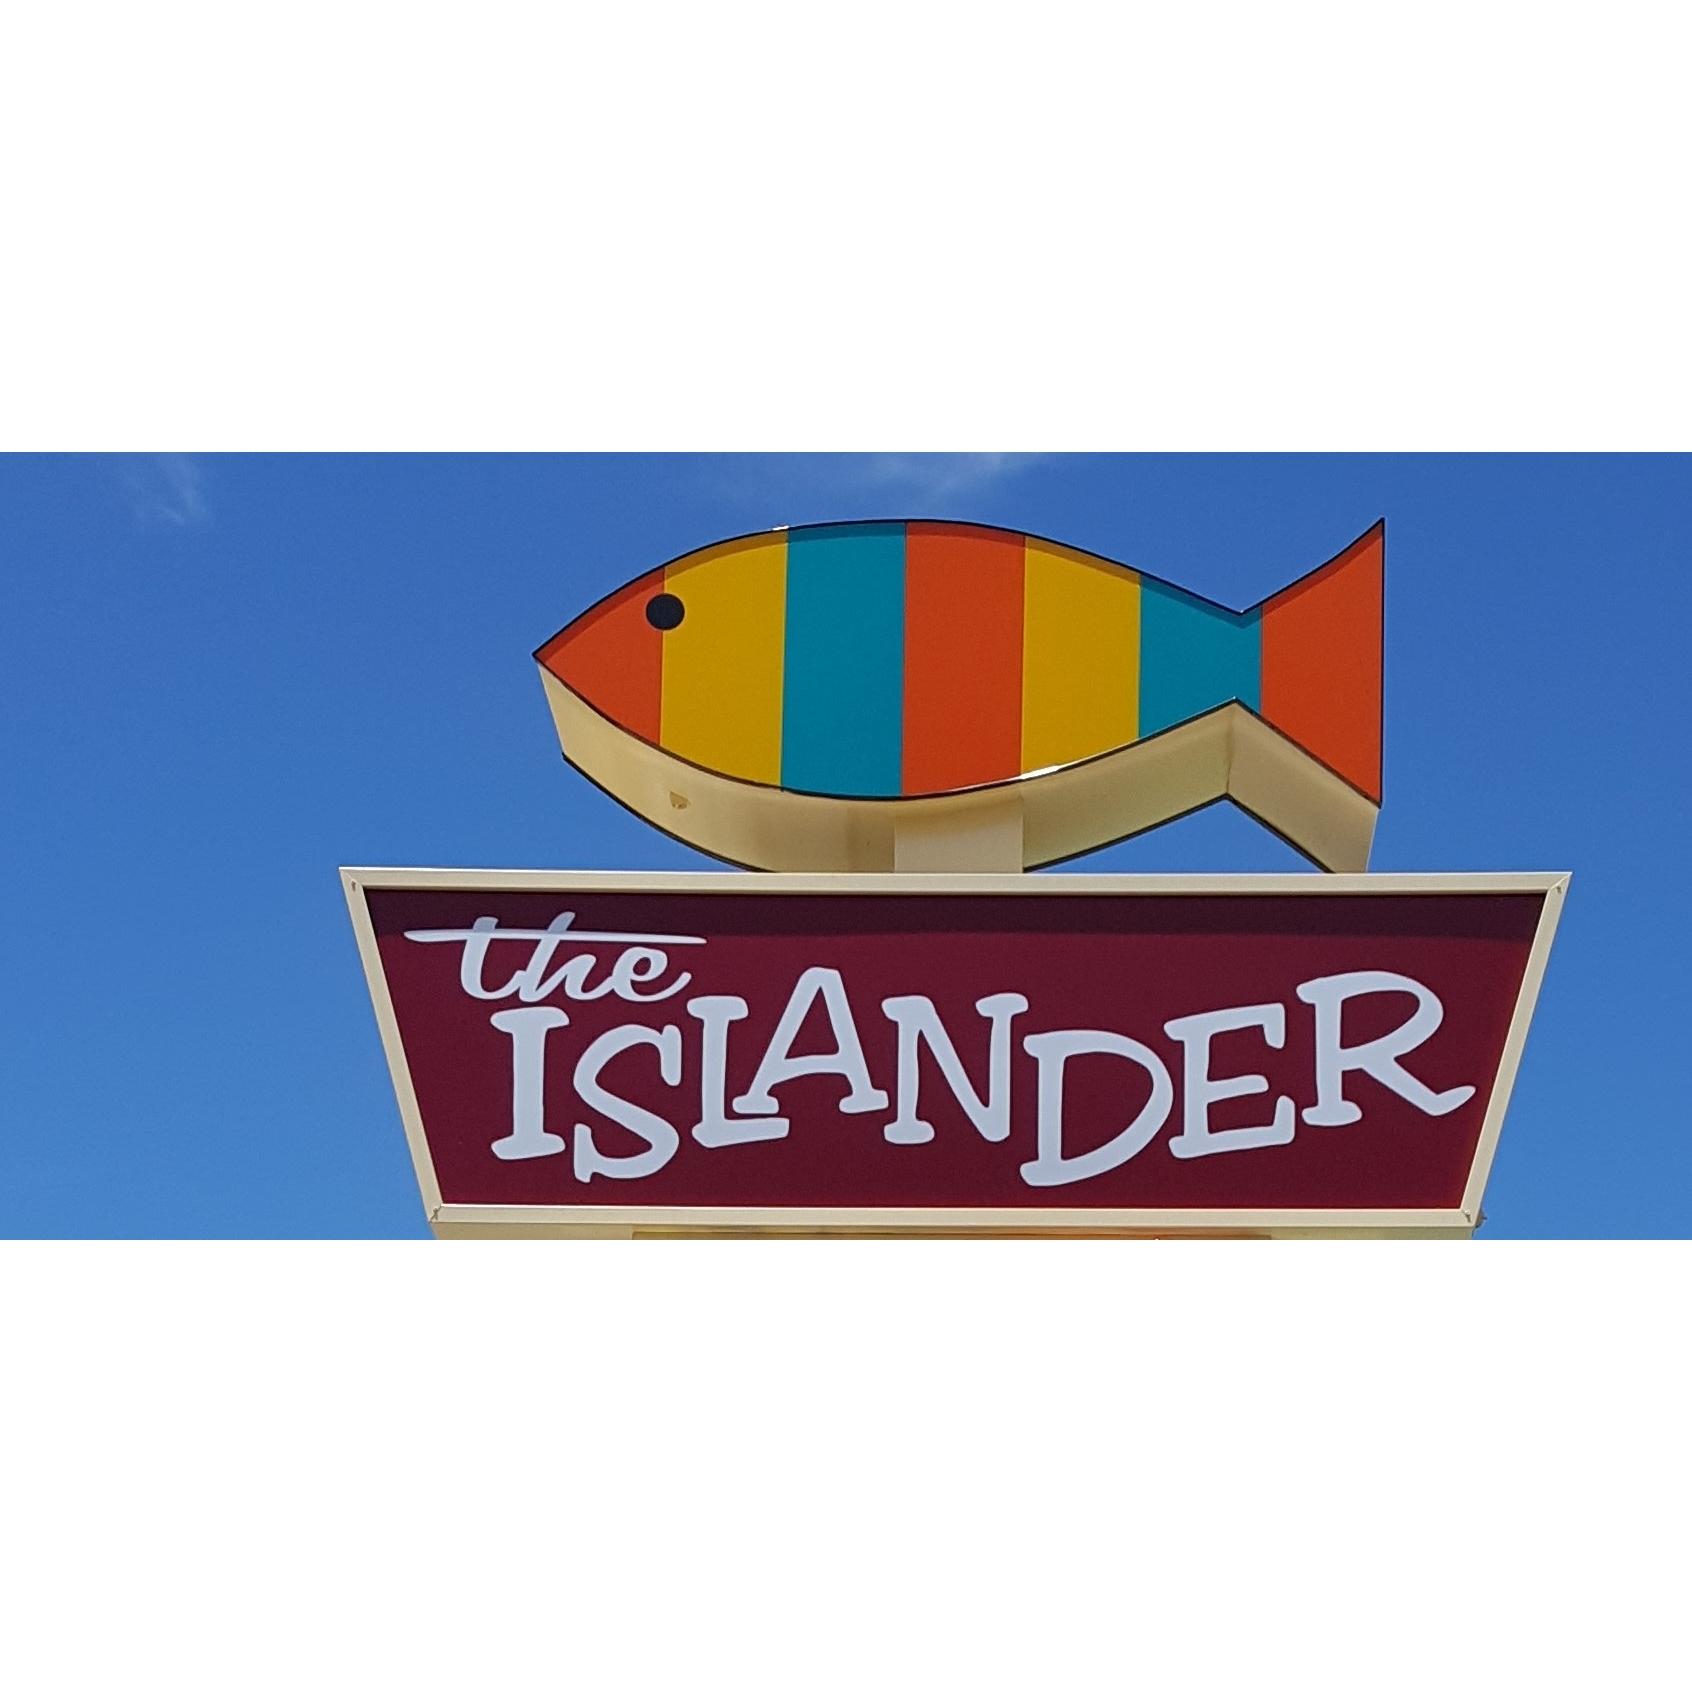 The Islander Motel